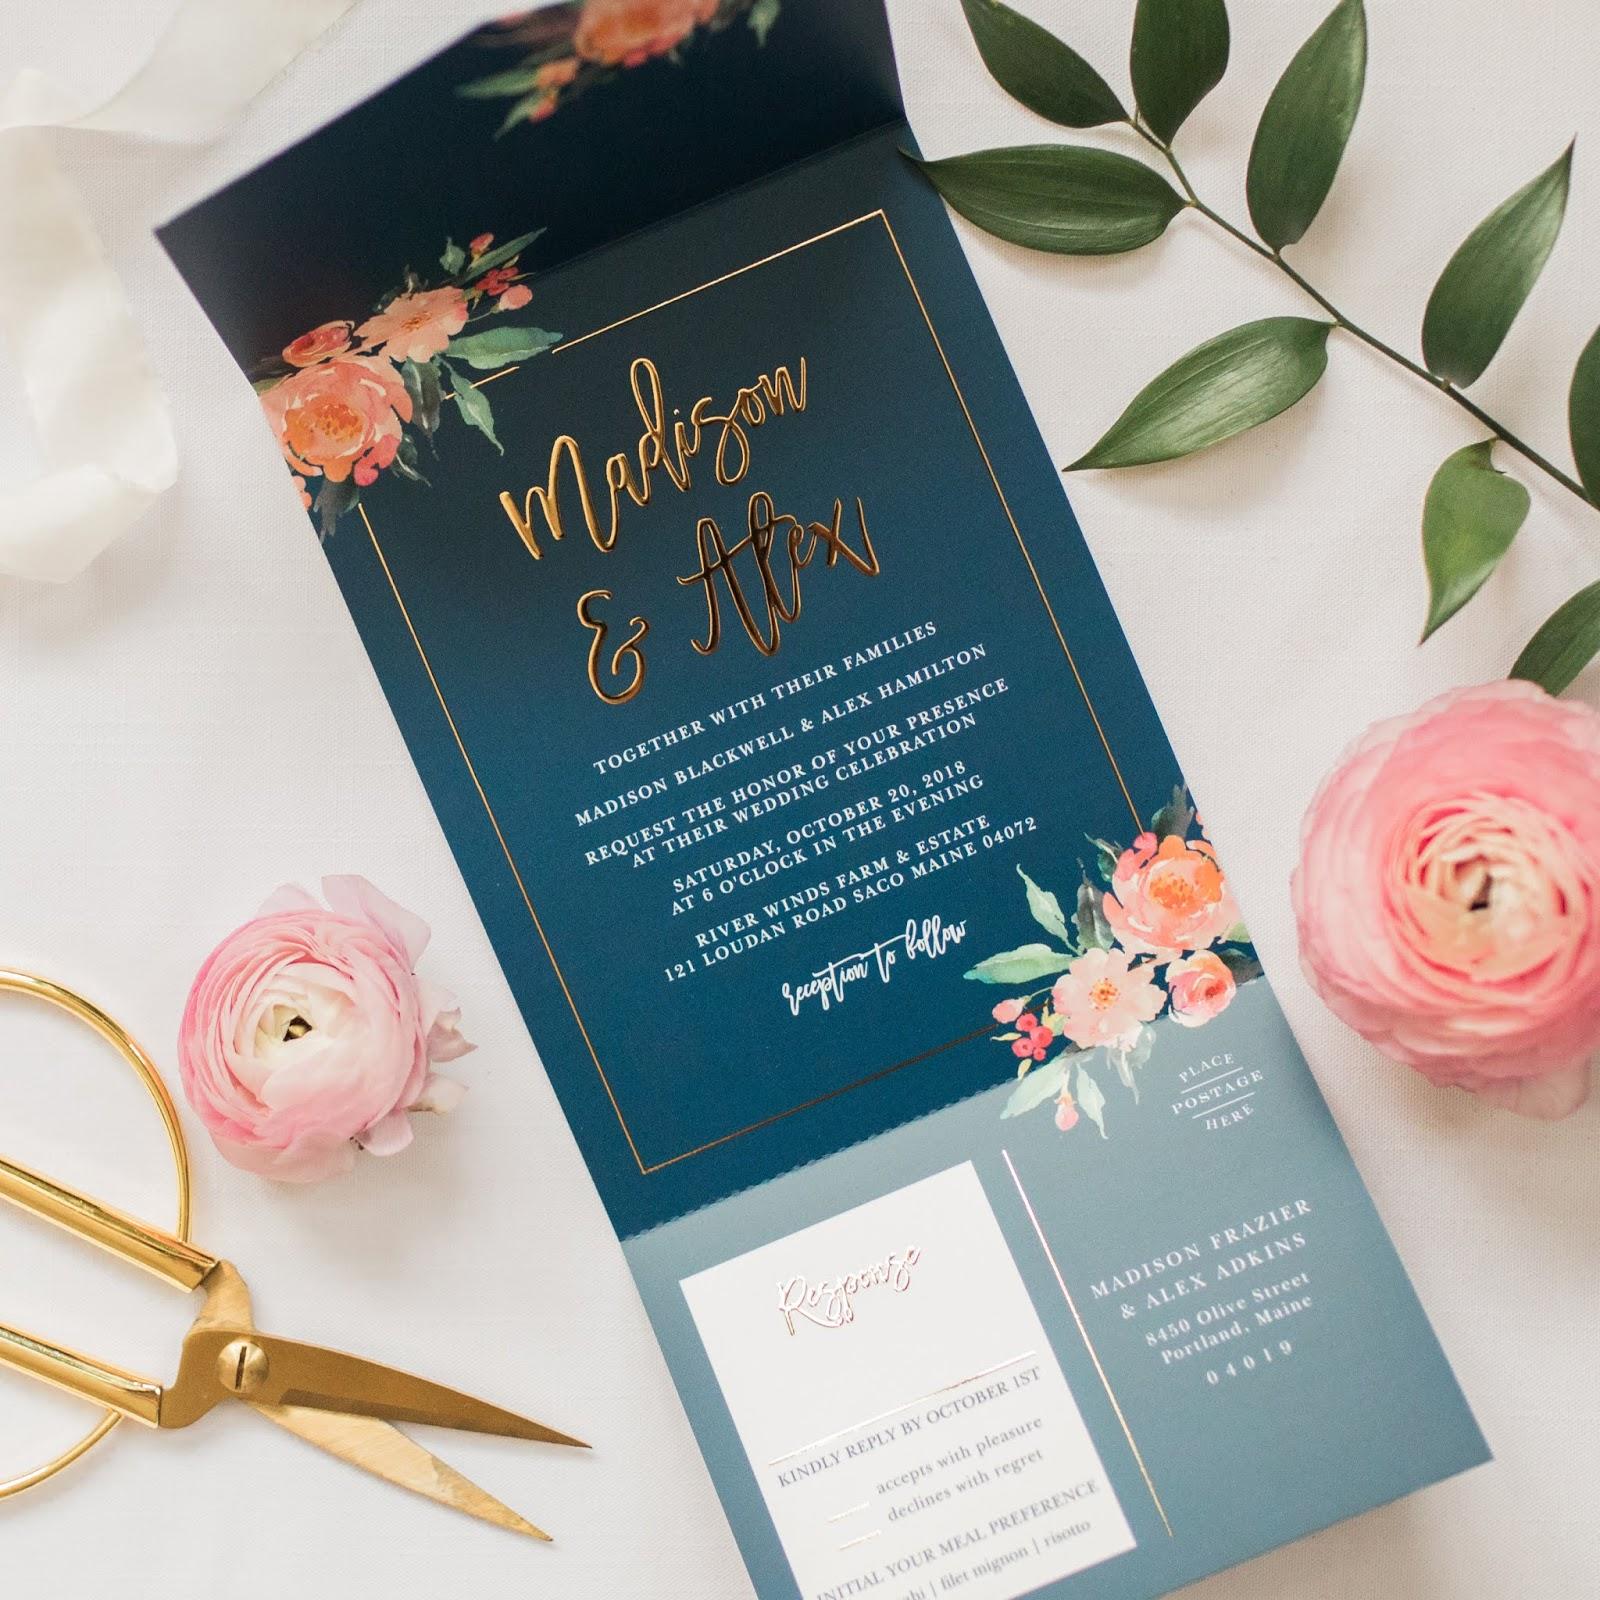 Personalized gay wedding invitations